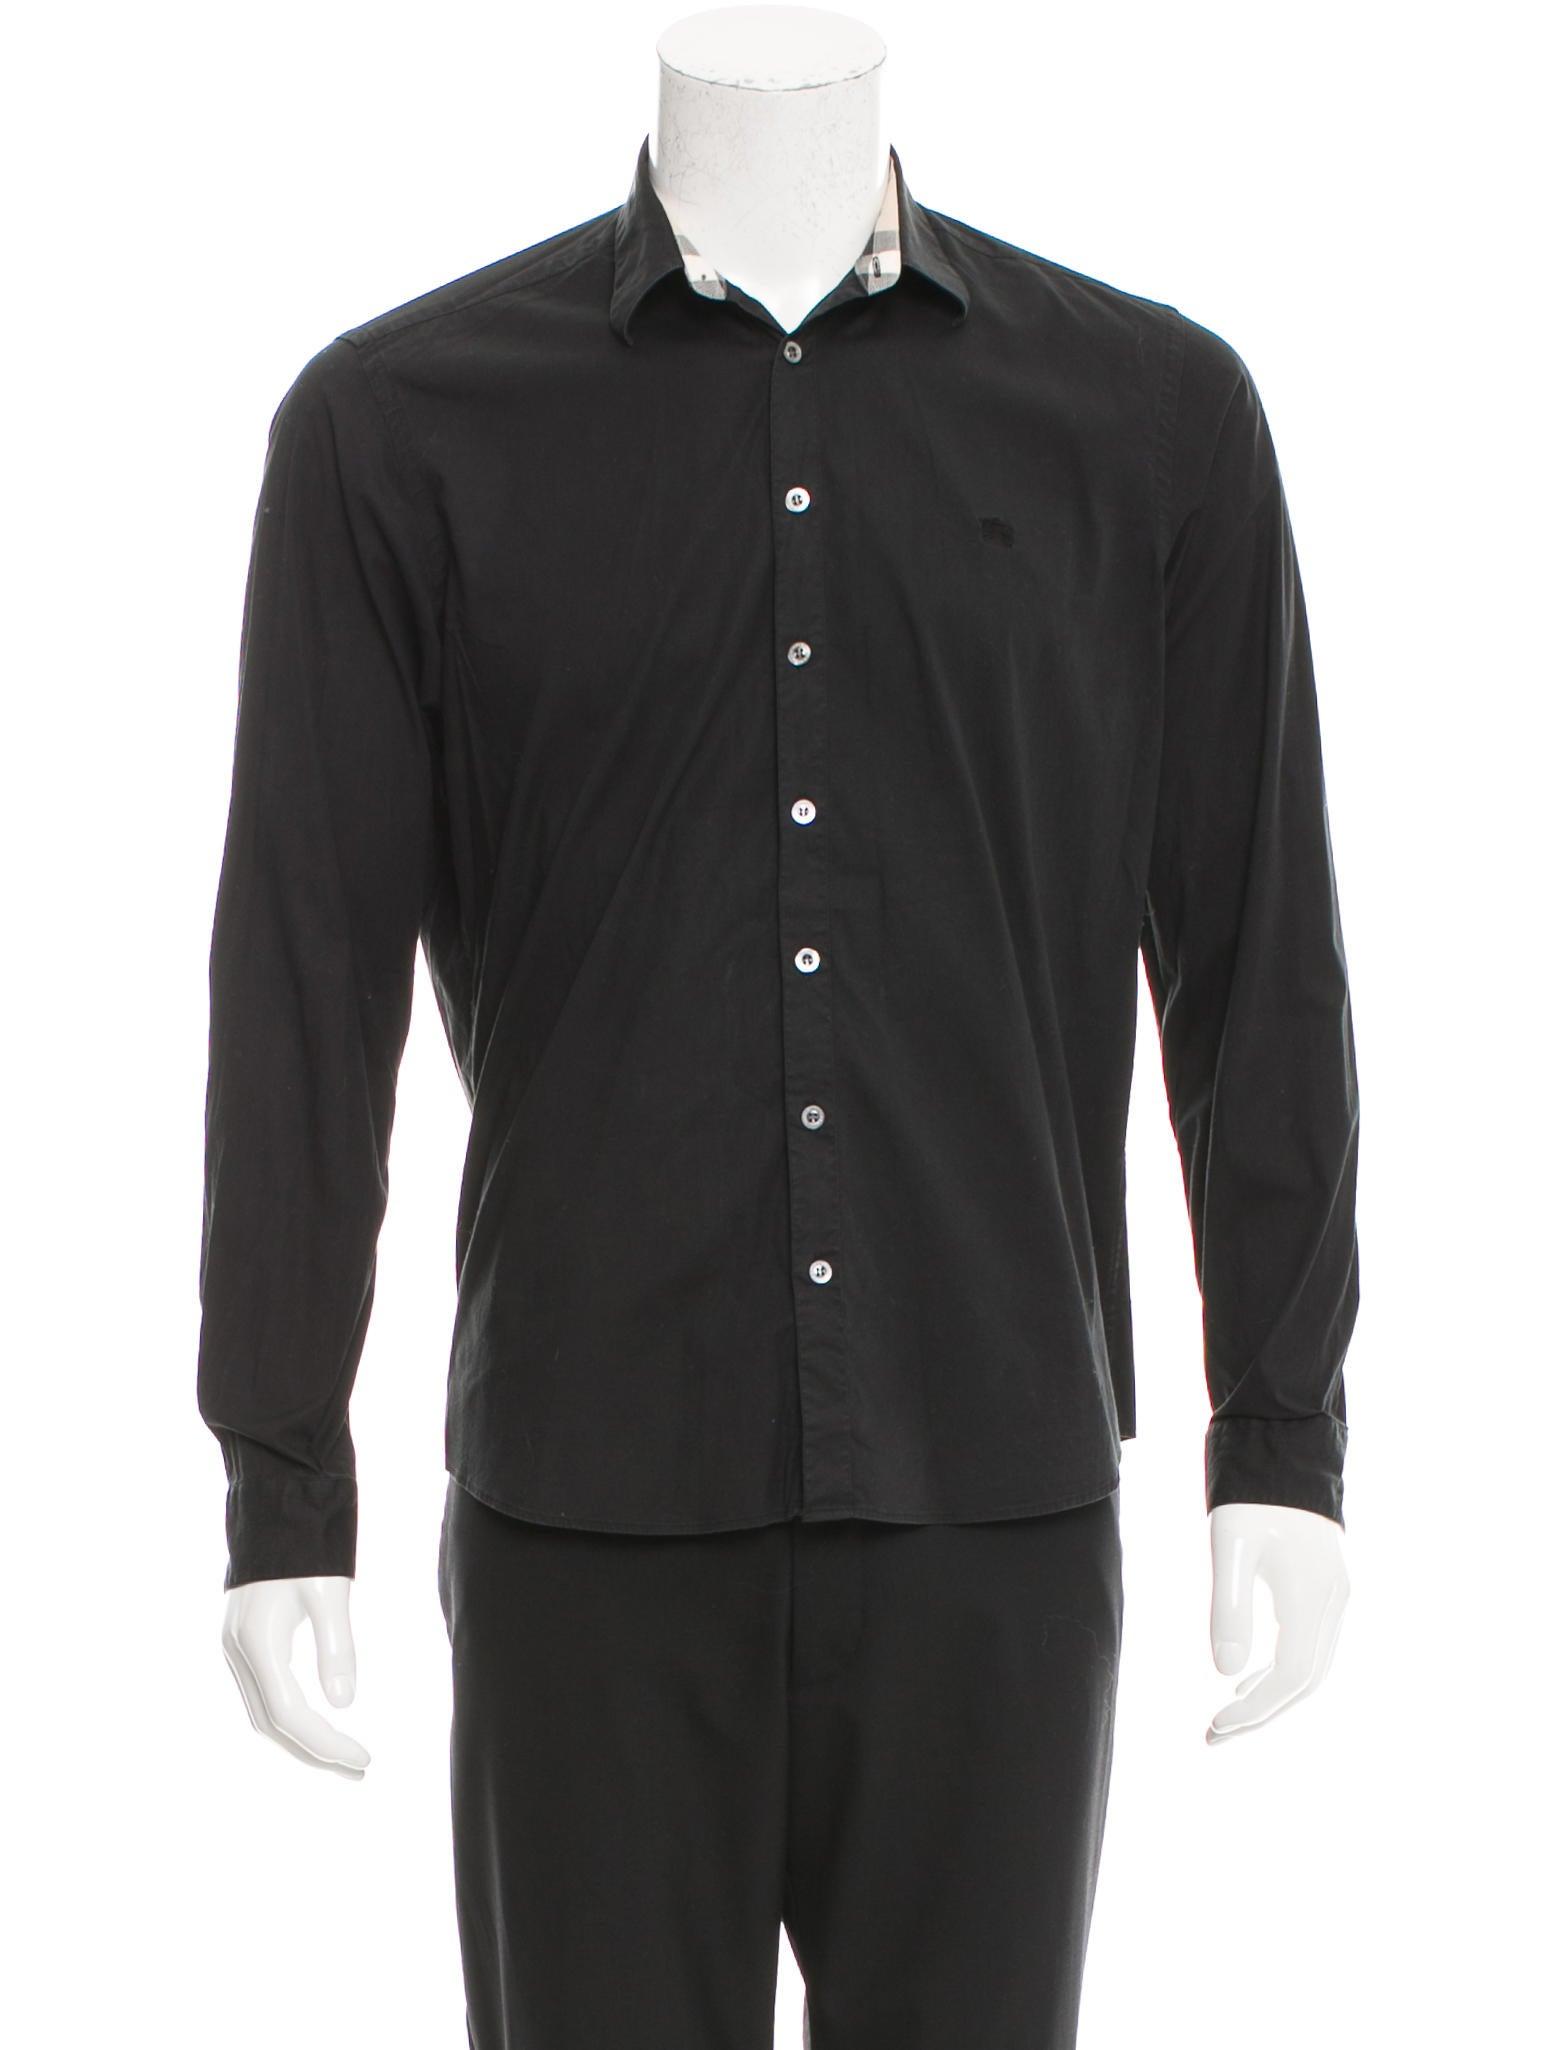 Burberry London Long Sleeve Button Up Shirt Clothing